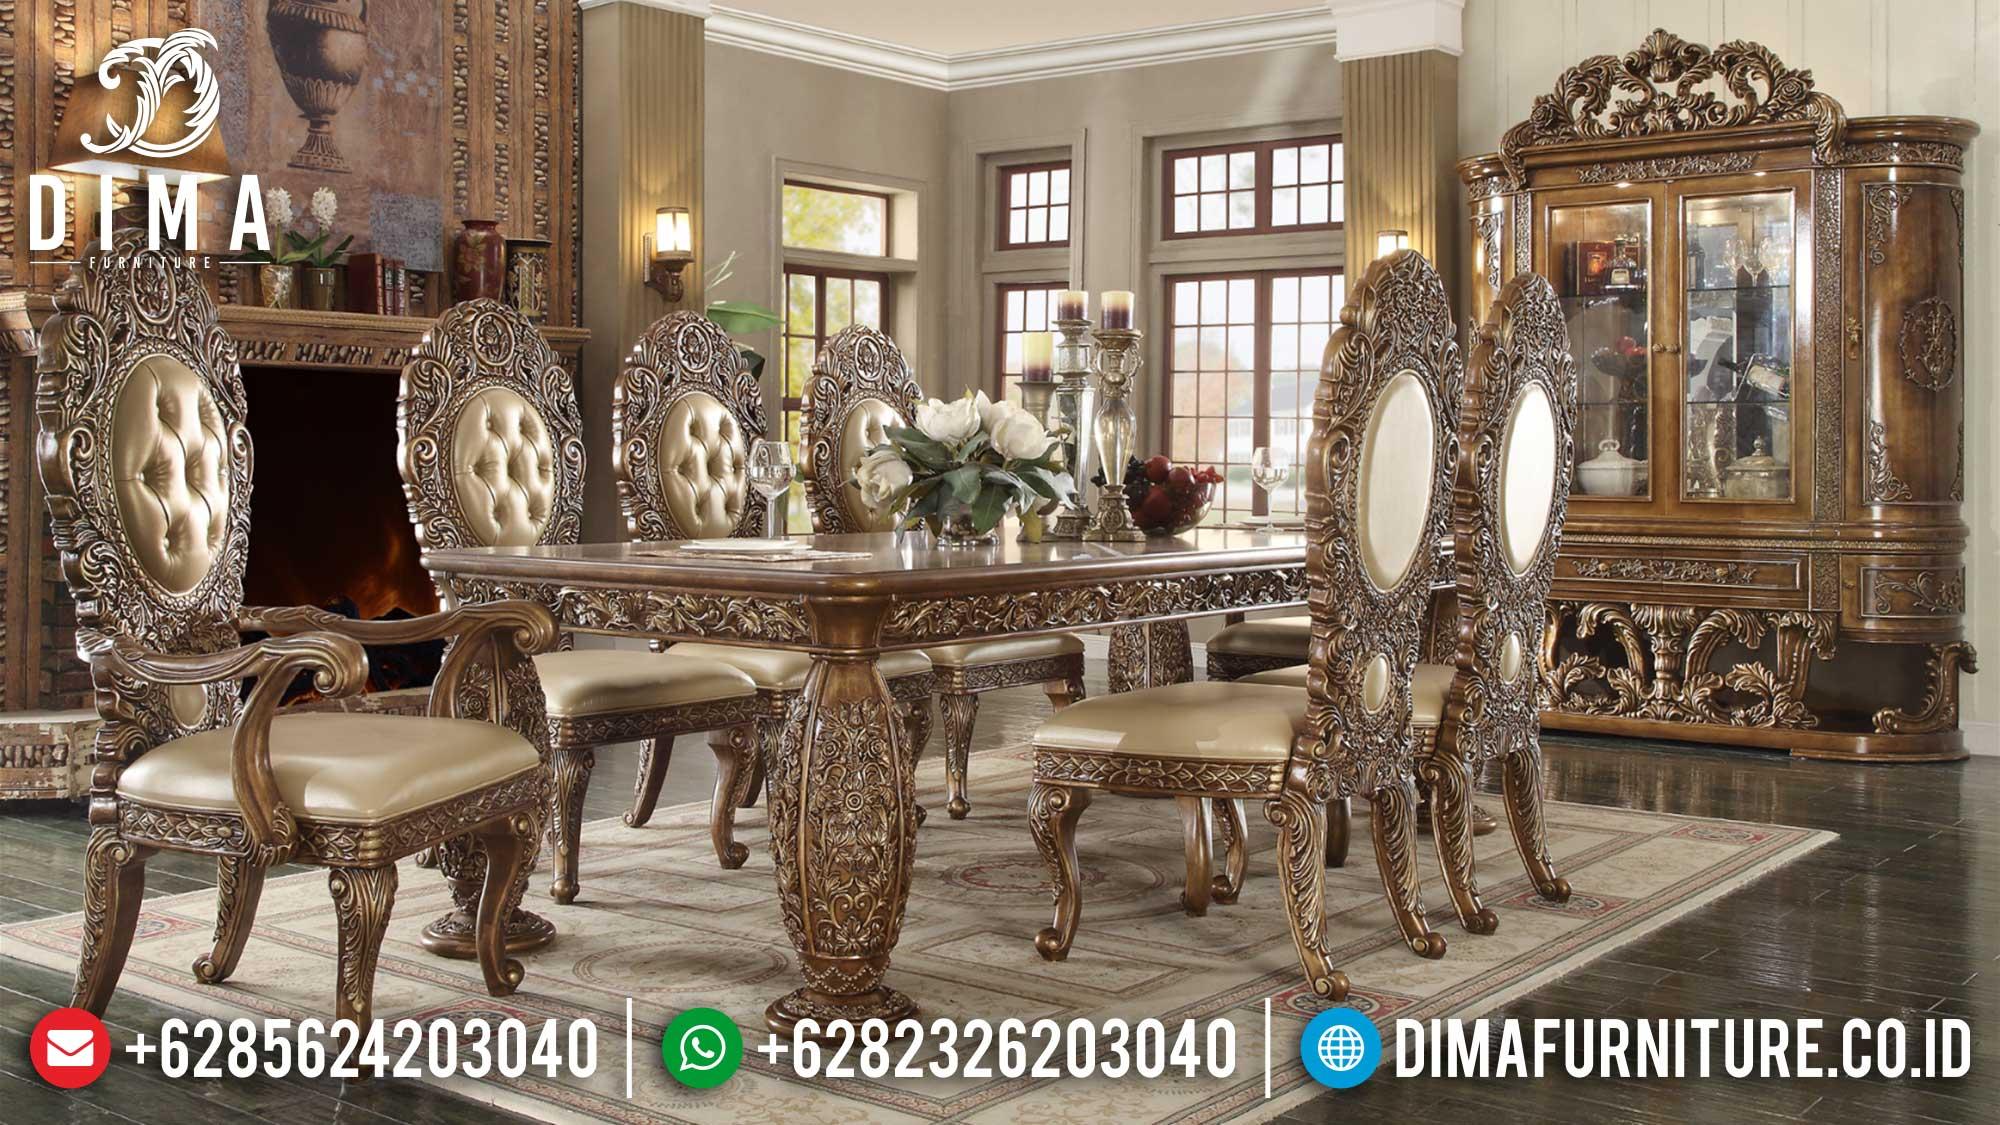 Great Meja Makan Ukiran Jepara Luxury Italian Carving Majestic Style TTJ-1689